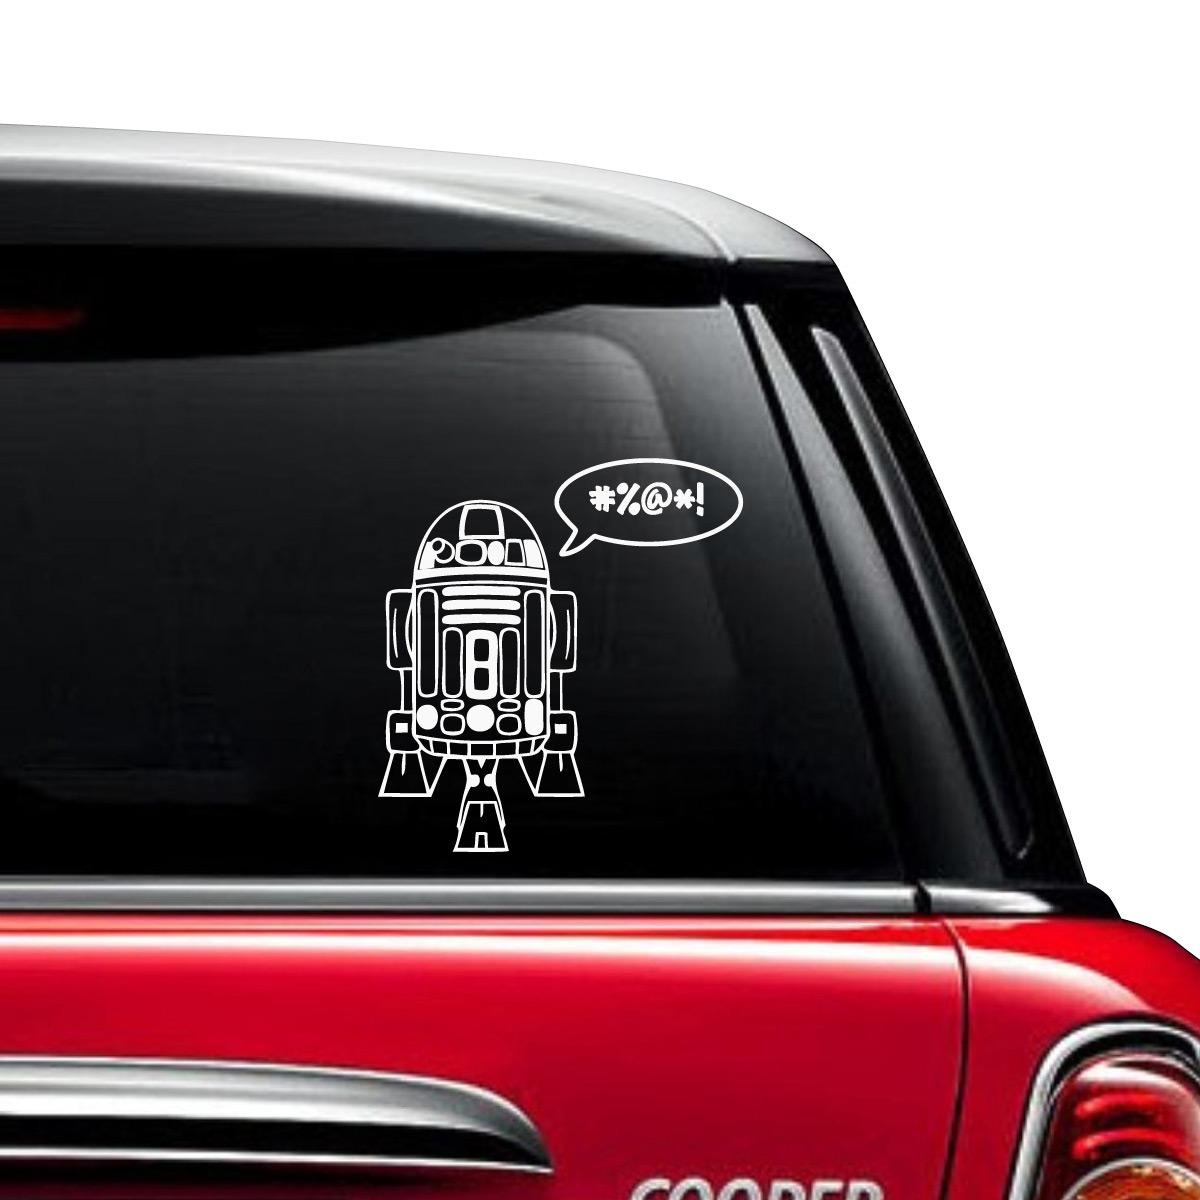 Star Wars Car Decals The Decal Guru - Star wars family car decals